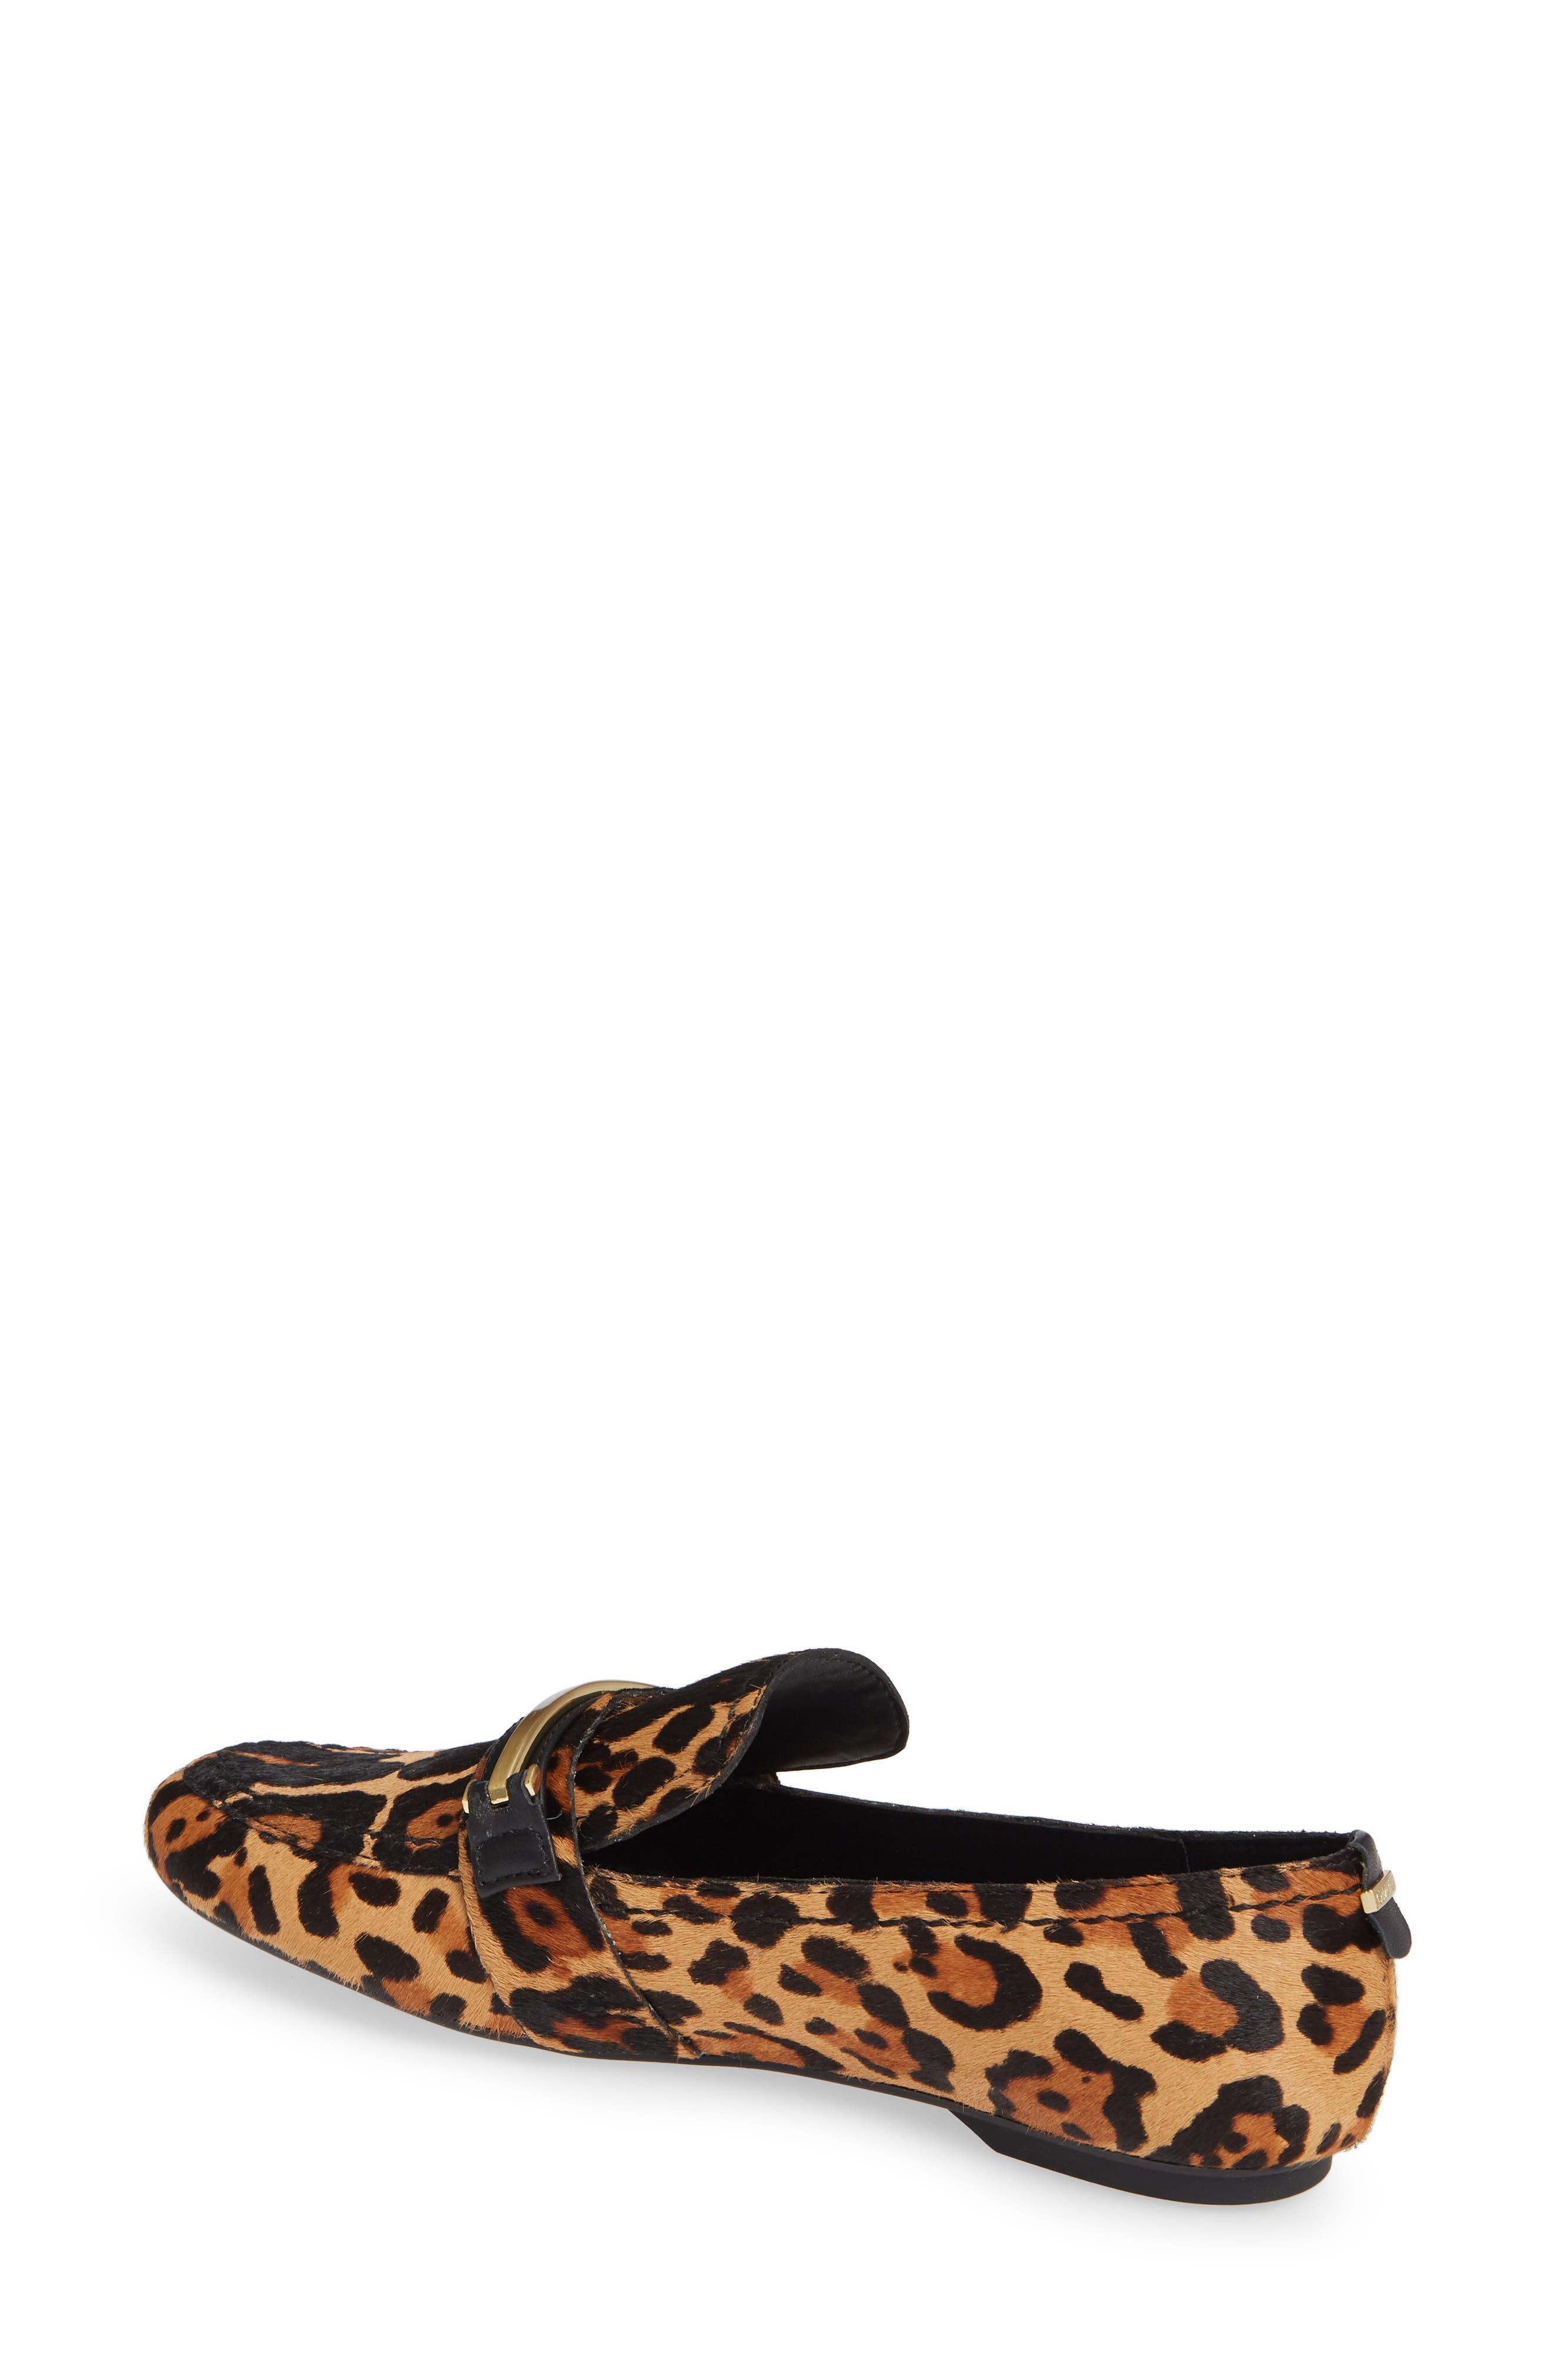 Orianna Genuine Calf Hair Loafer,                             Alternate thumbnail 2, color,                             LEOPARD CALF HAIR